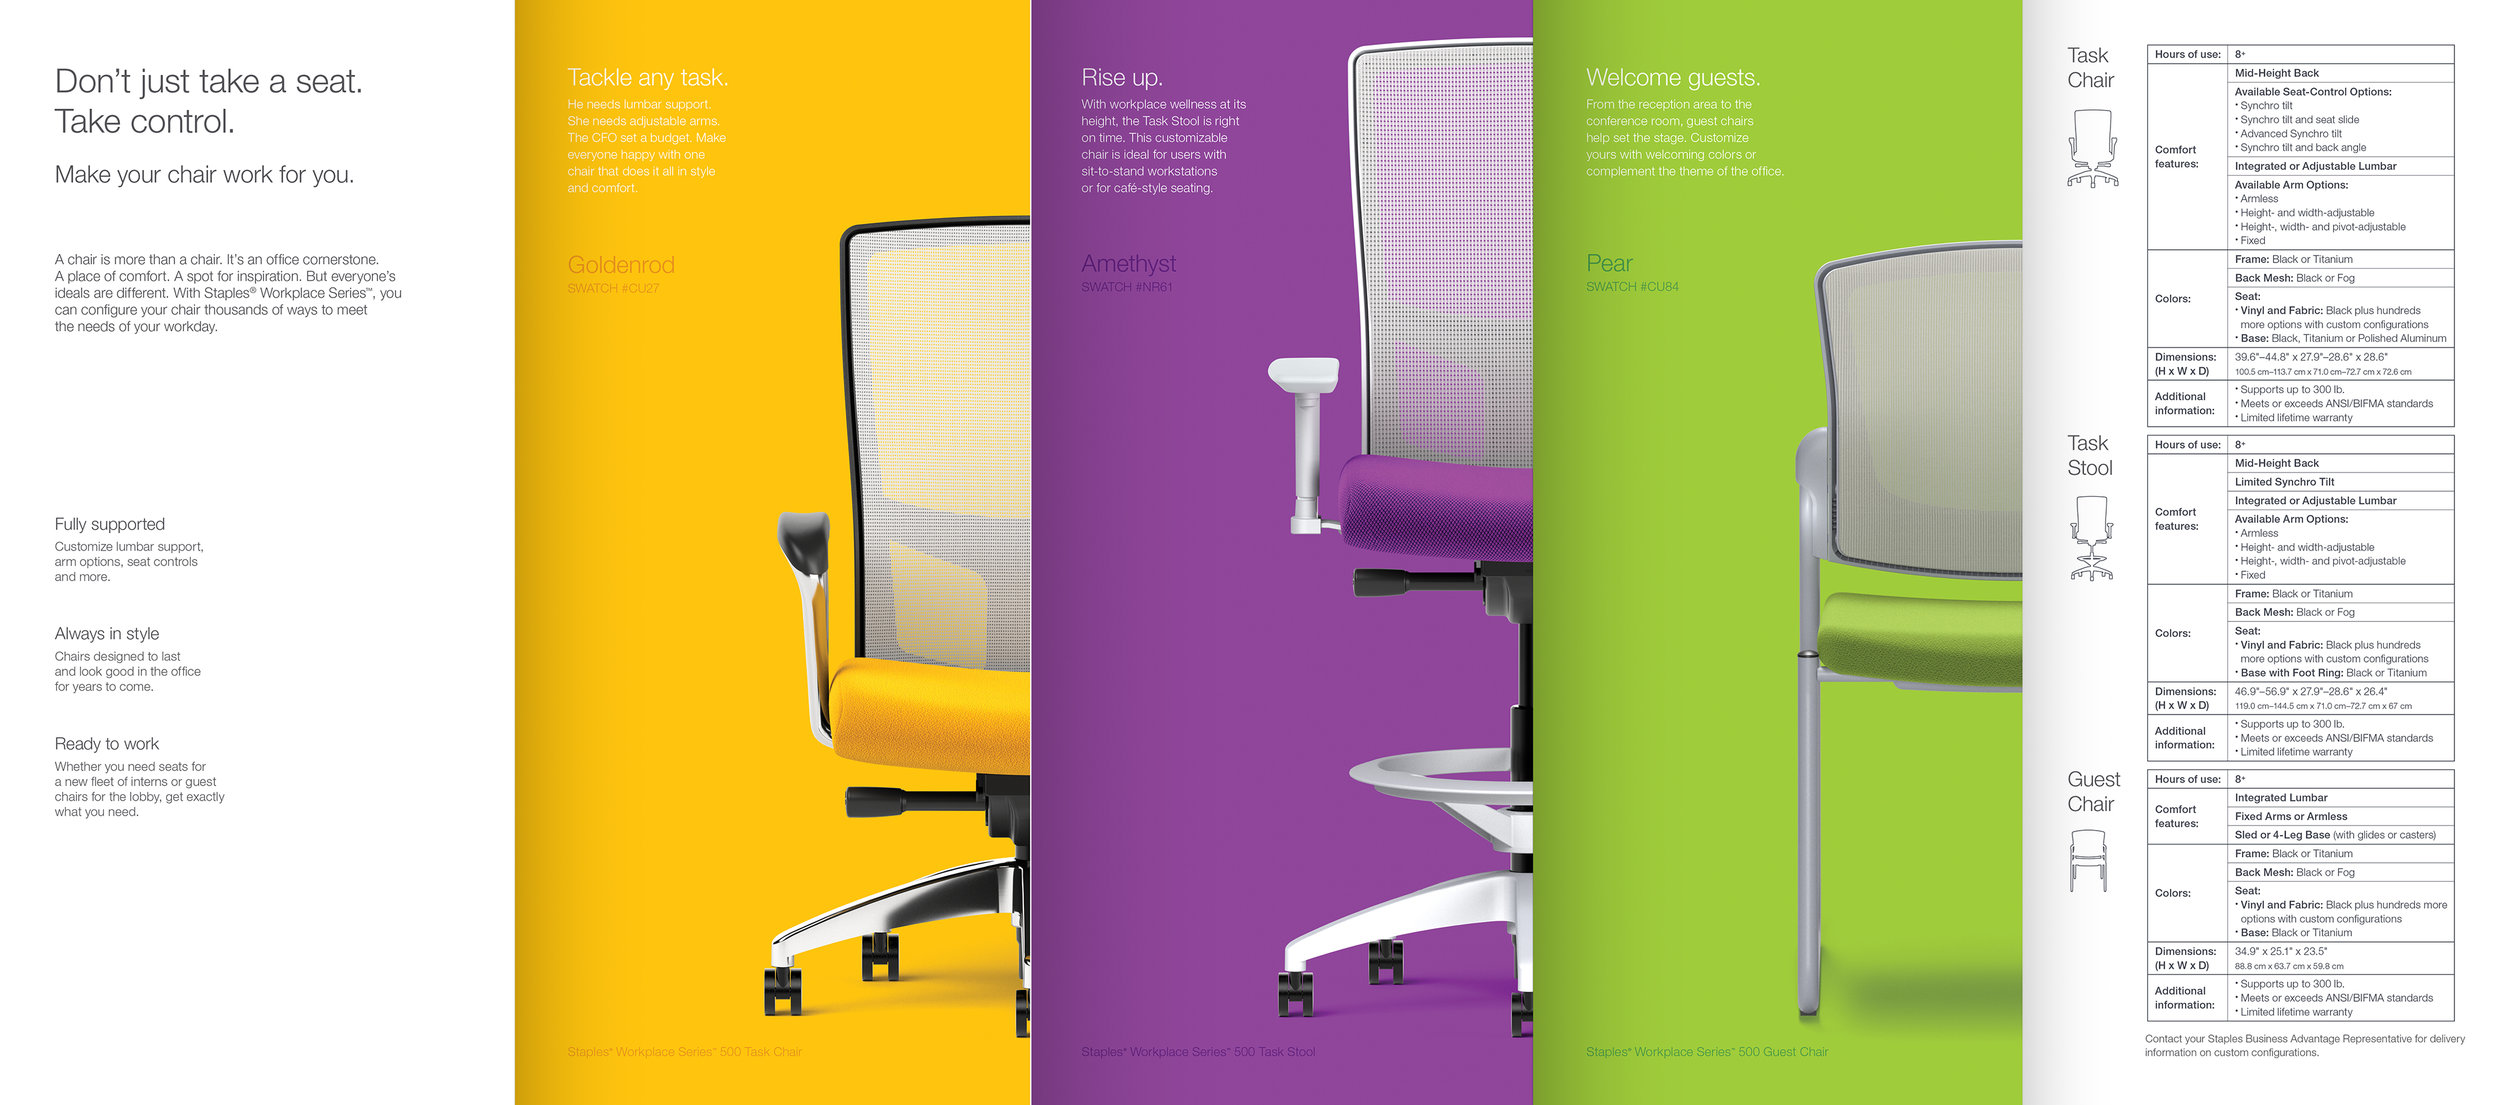 65893_Workplace_Brochure_Print_new023shadow_sm.jpg